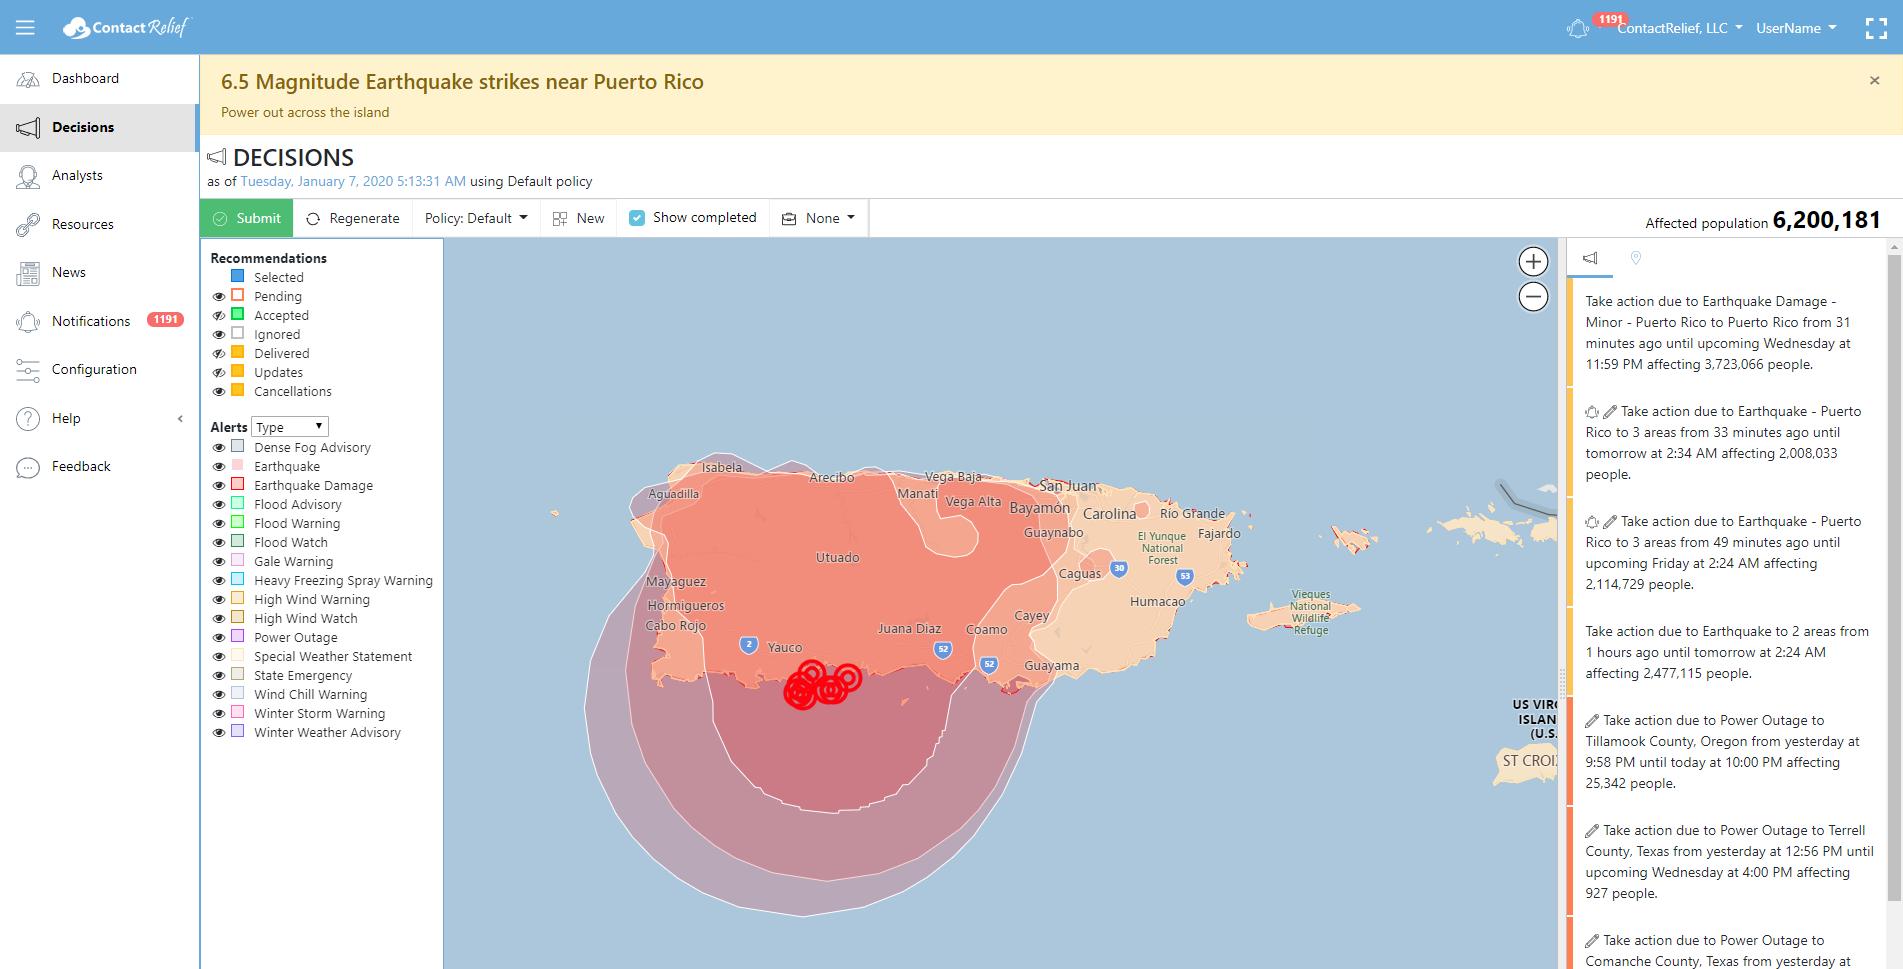 Magnitude 6.5 Earthquake Swarm Strikes Puerto Rico